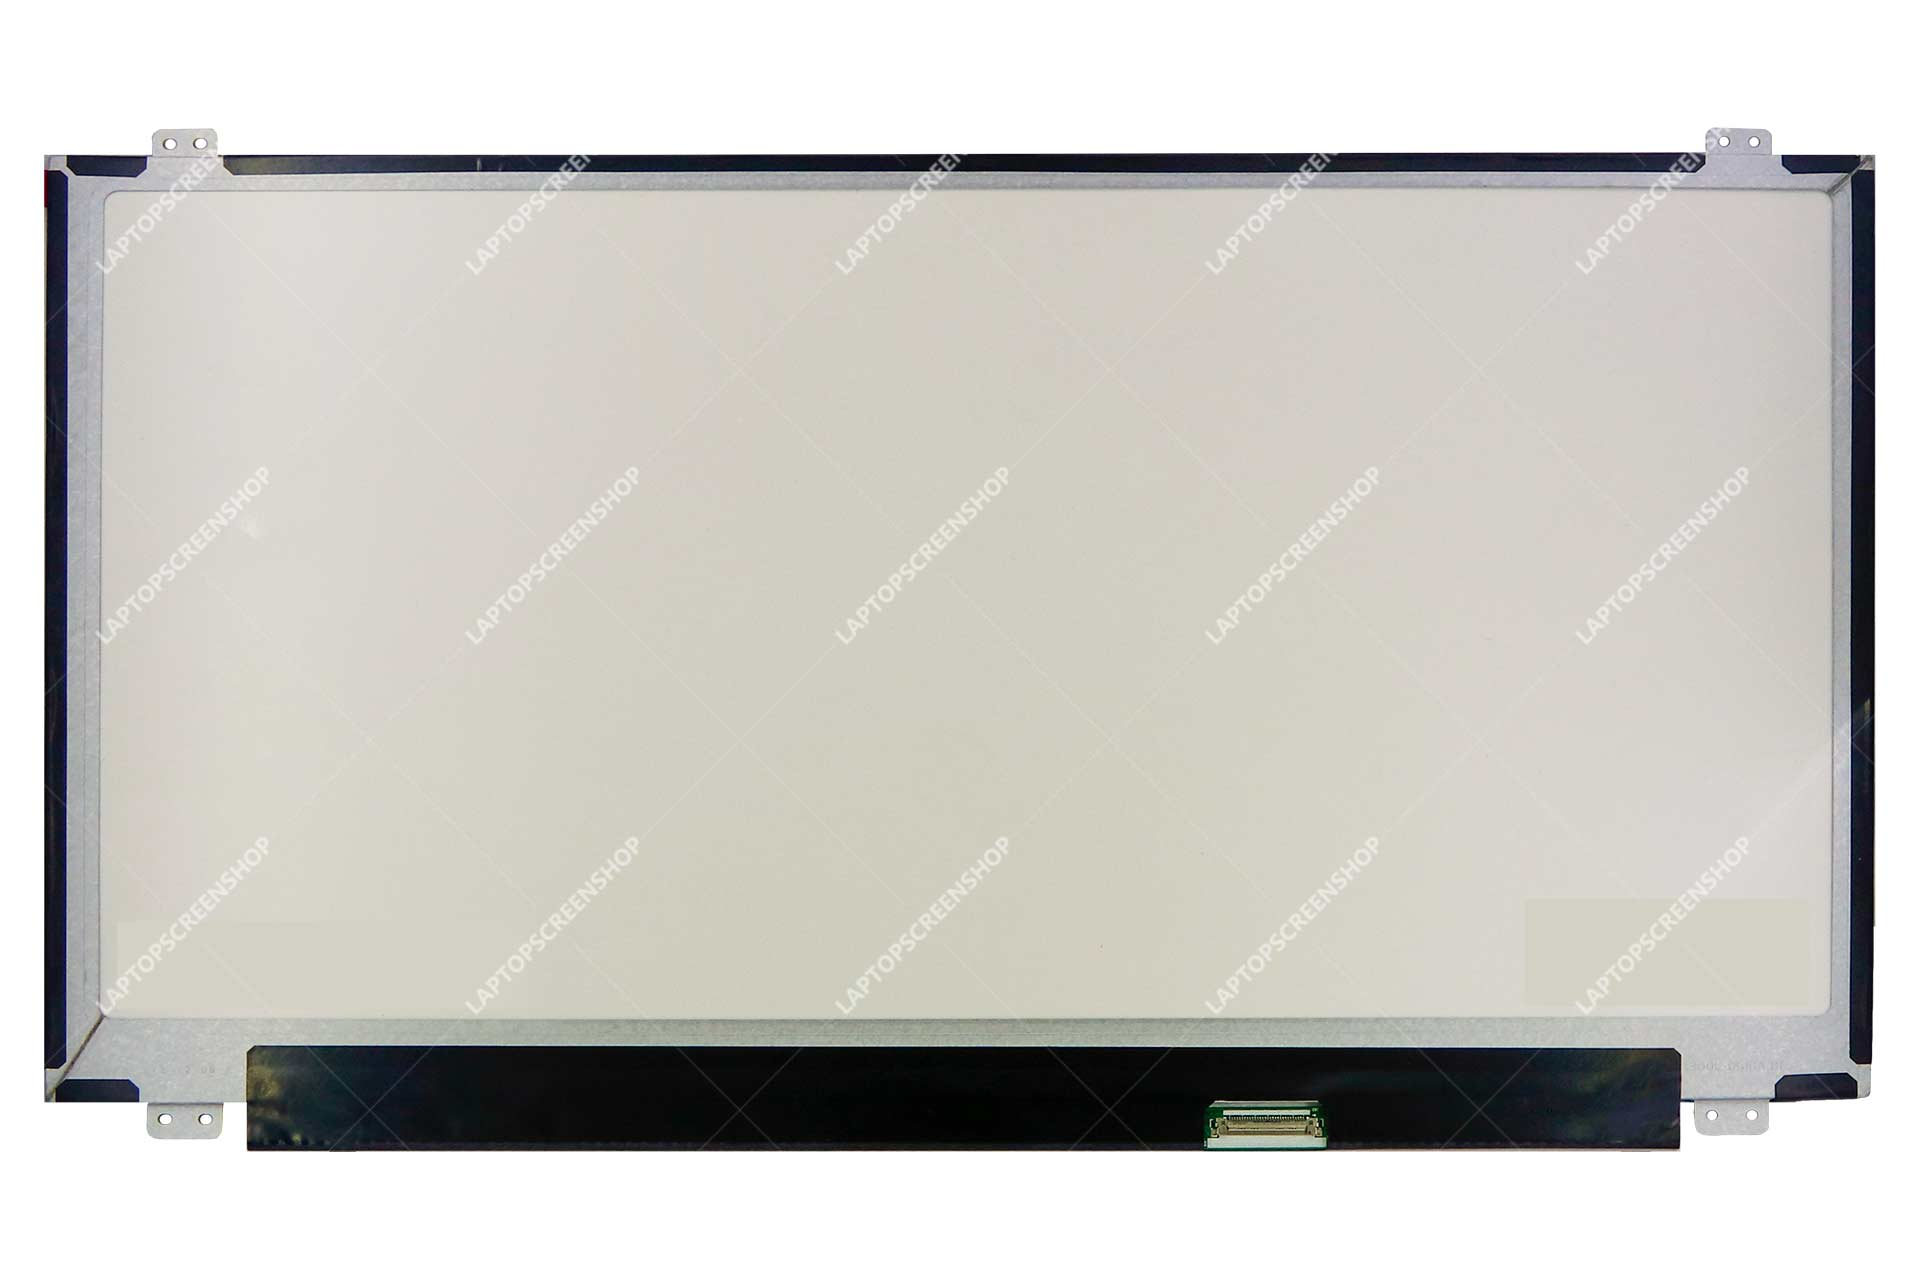 ACER-ASPIRE-E1-521-7843-LCD |HD|فروشگاه لپ تاپ اسکرين | تعمير لپ تاپ